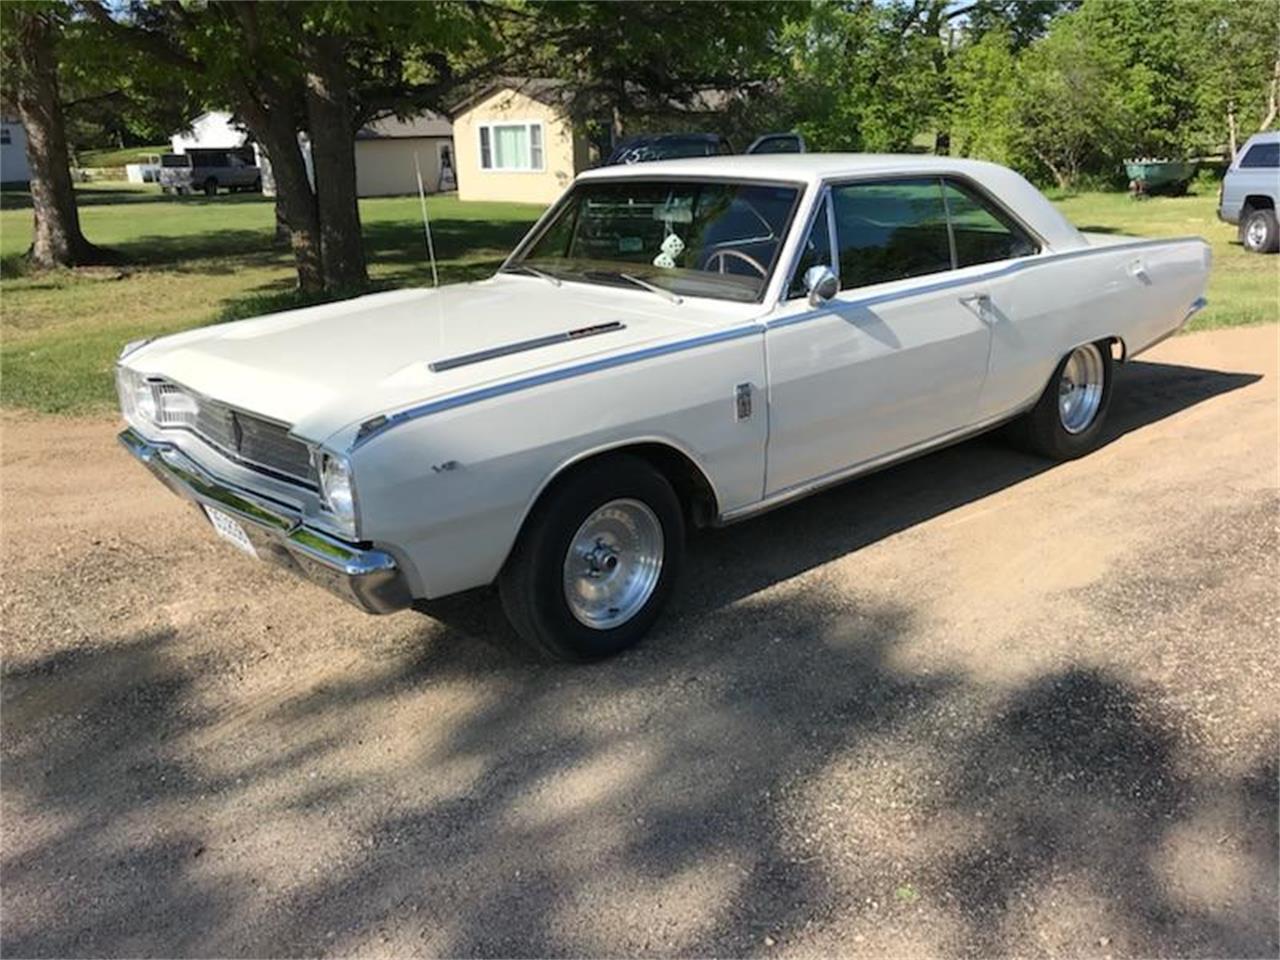 1967 Dodge Dart Gt For Sale Classiccarscom Cc 1043853